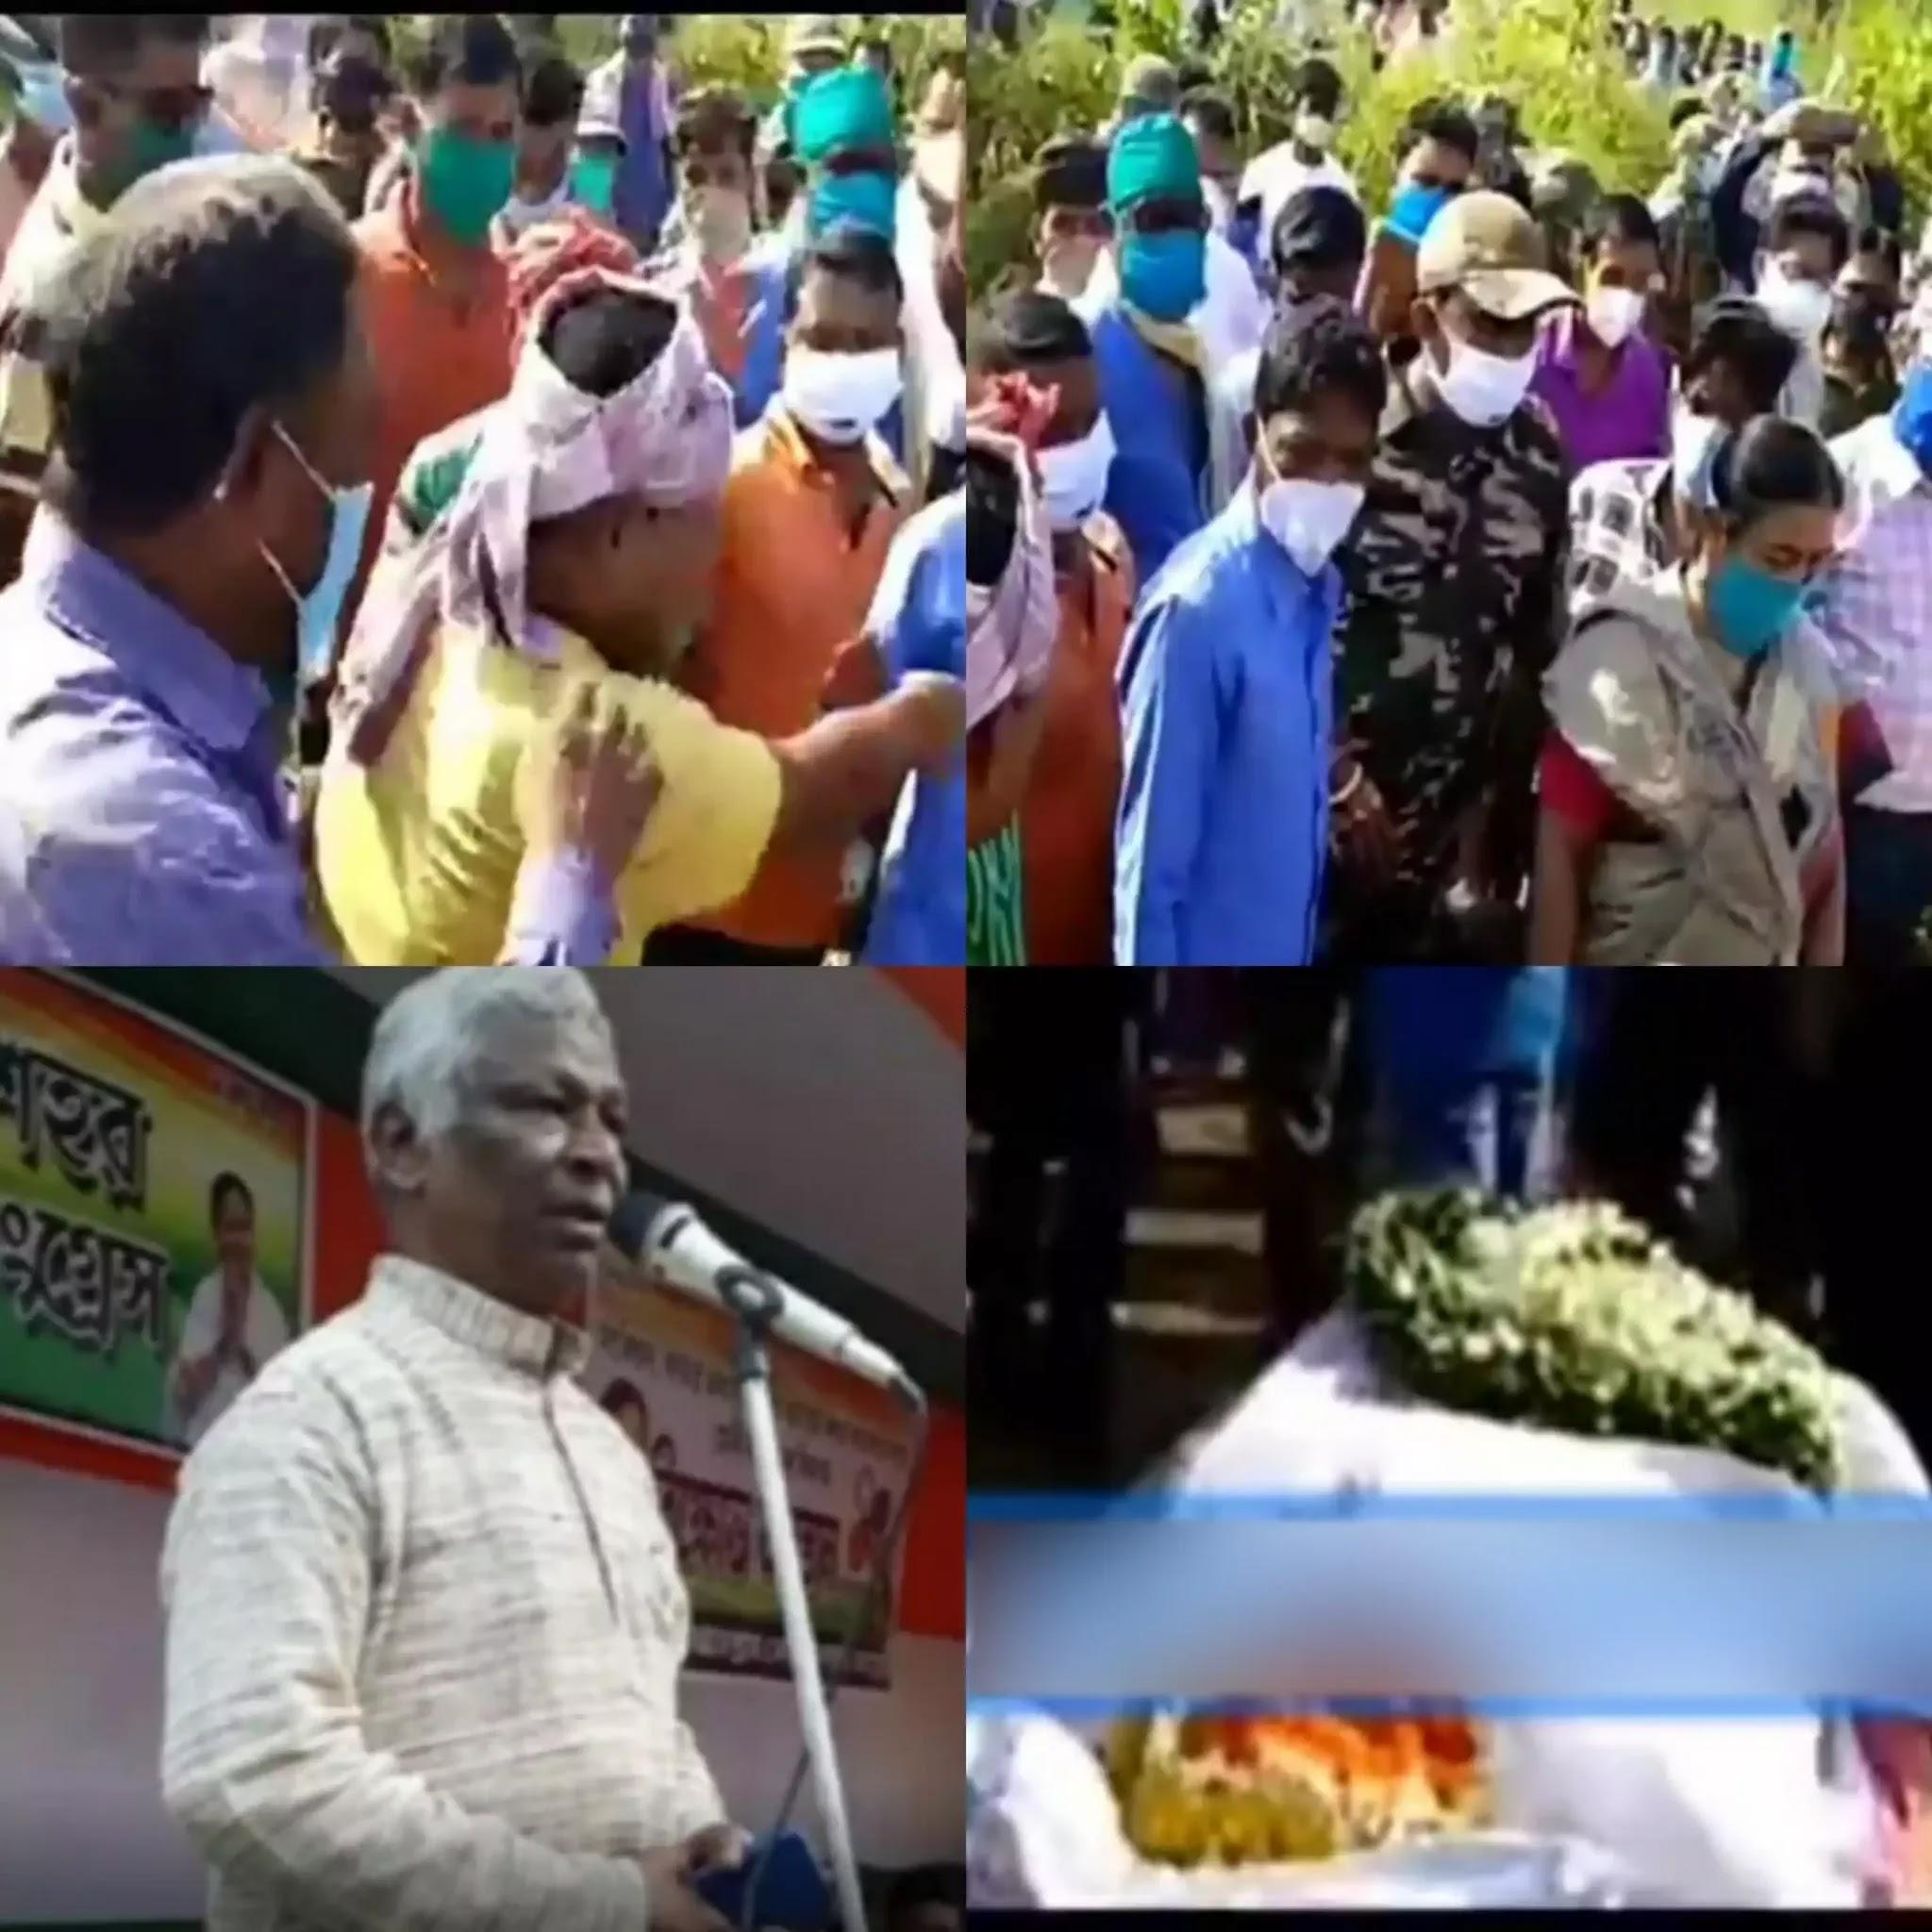 Sukumar-Hansda-took-the-funeral-and-broke-the-disturbance